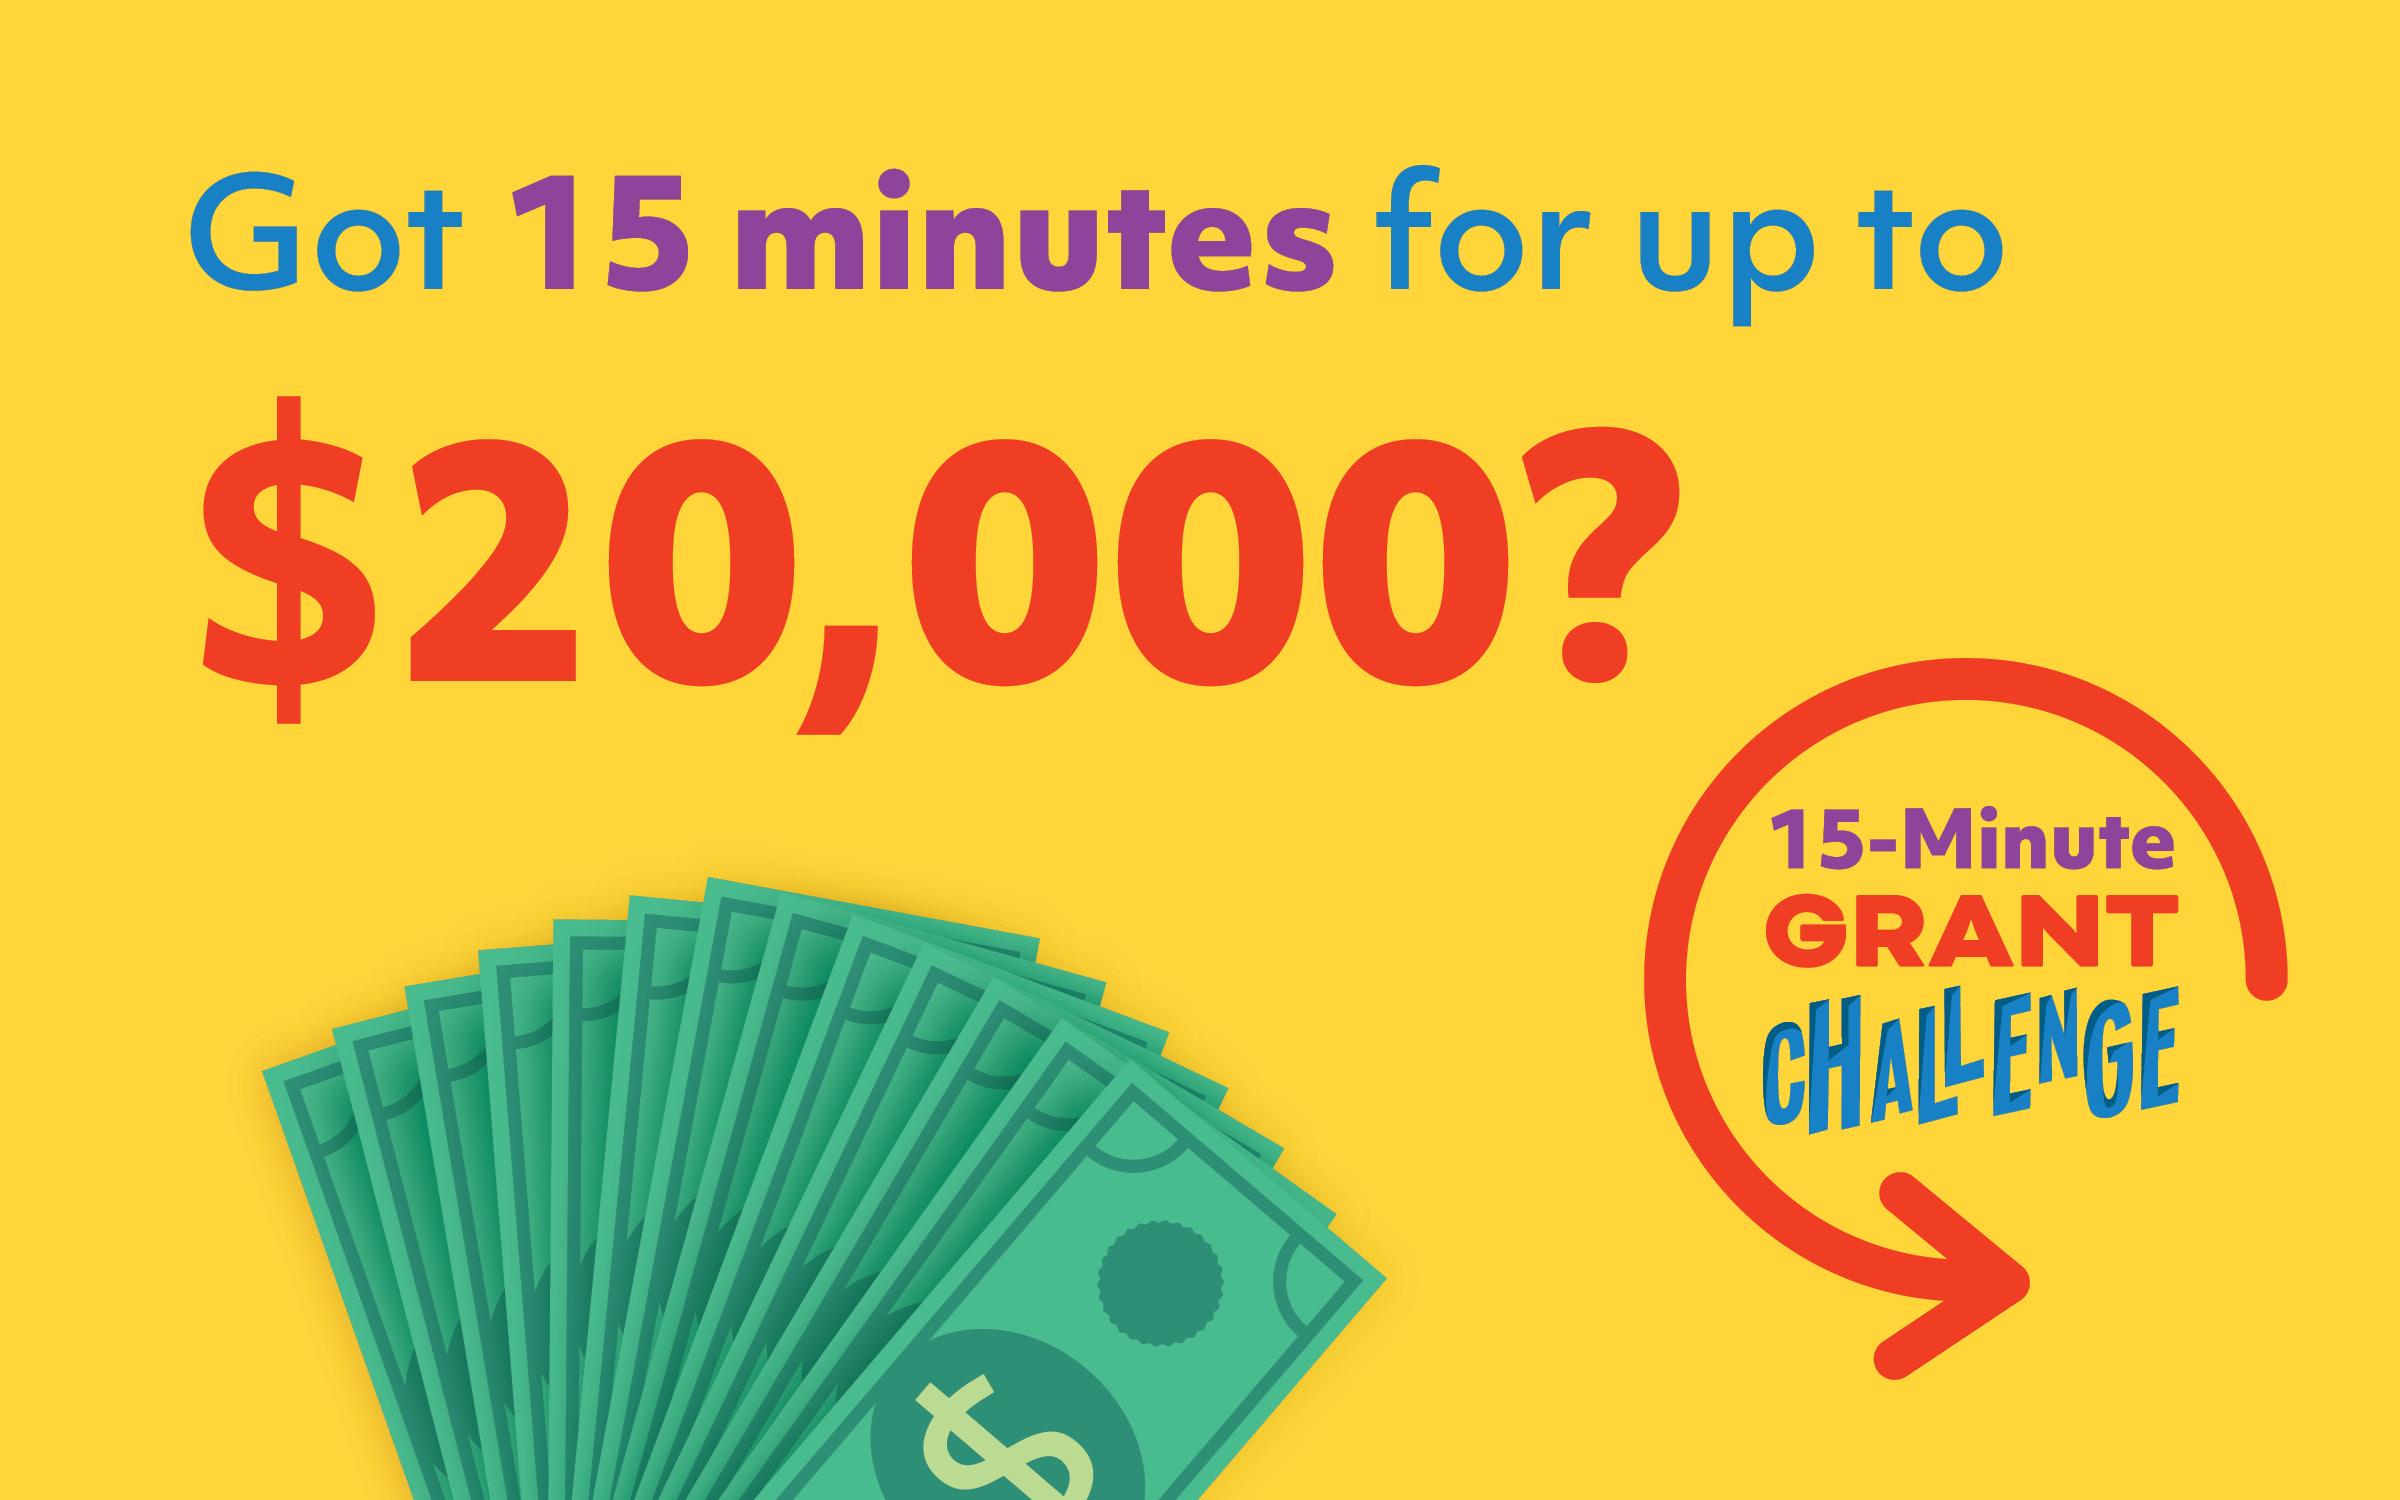 15 Min Grant Challenge Media Image - Horizontal